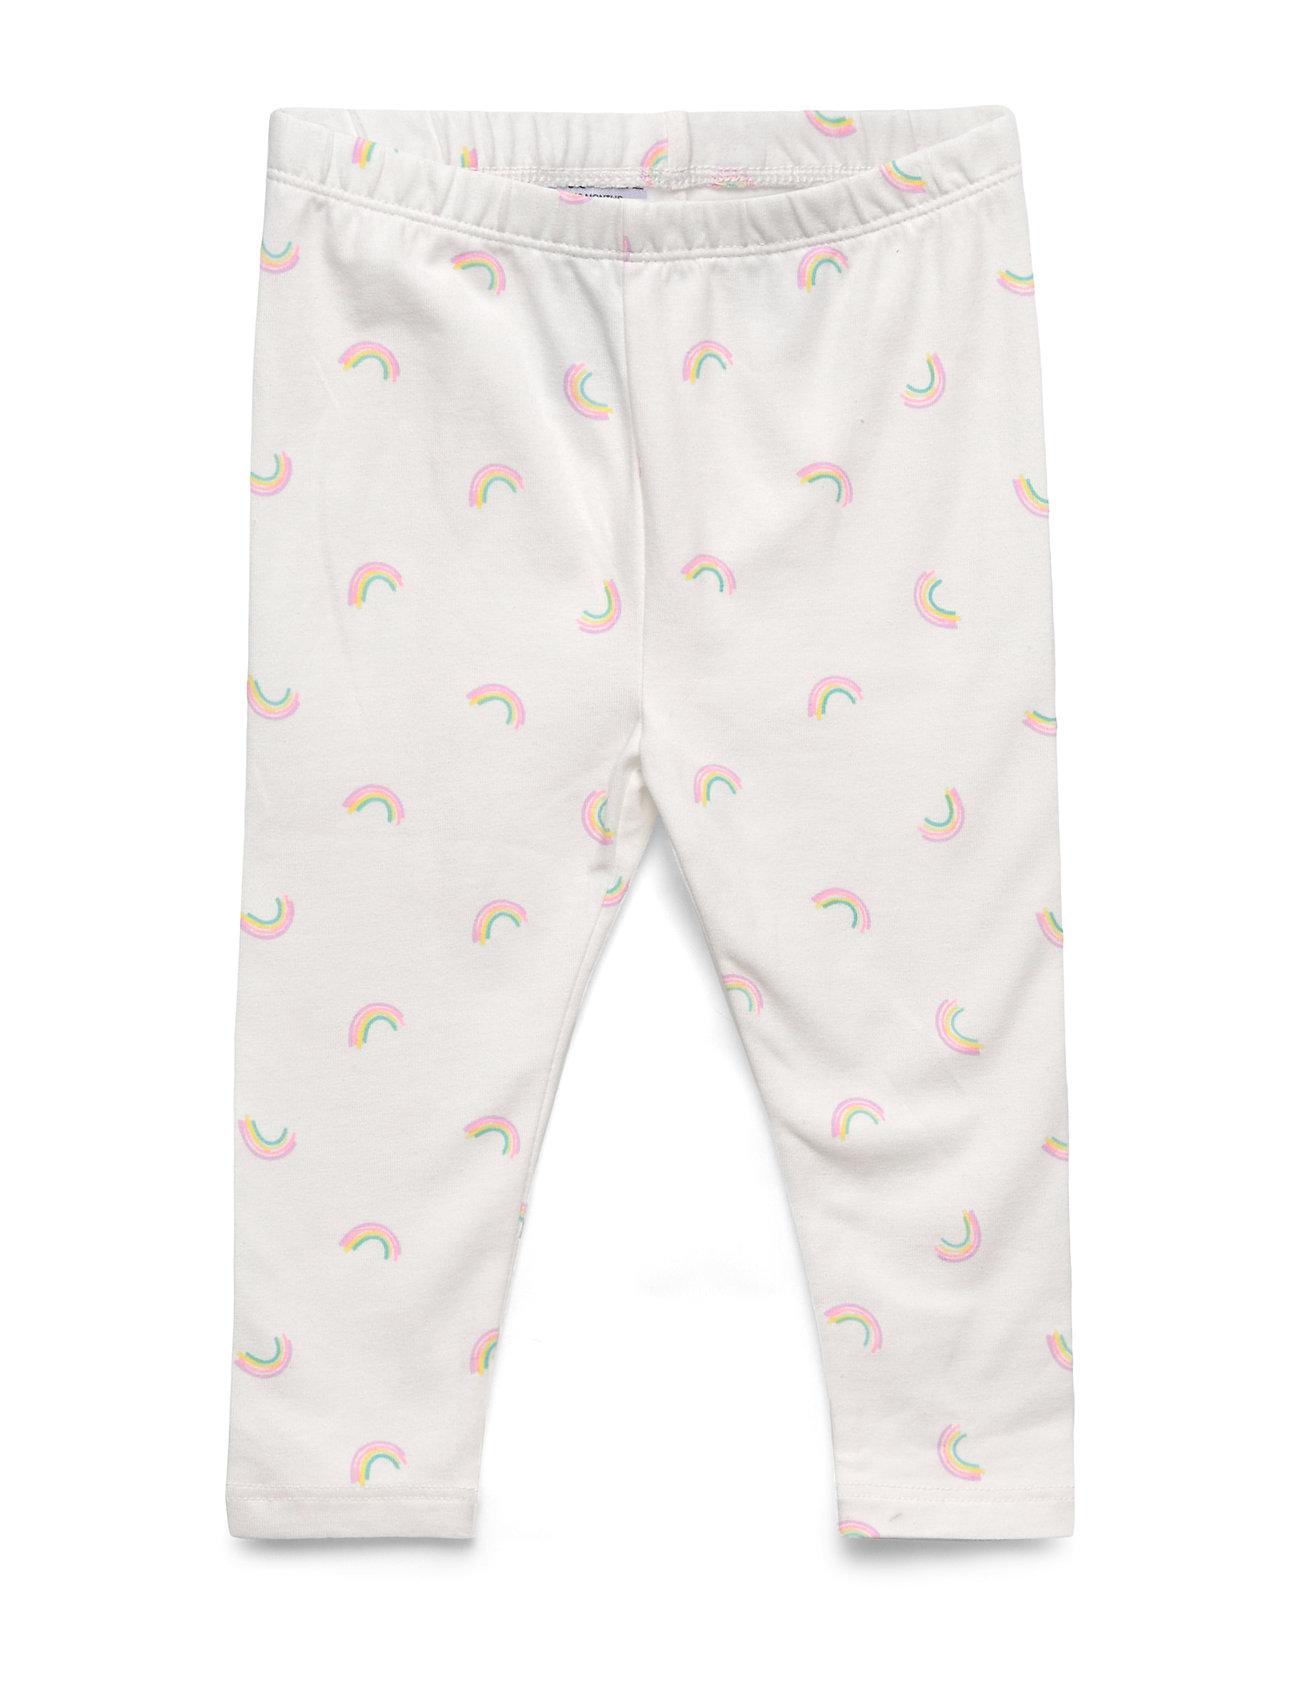 GAP Toddler Everyday Leggings - RAINBOW DAISY